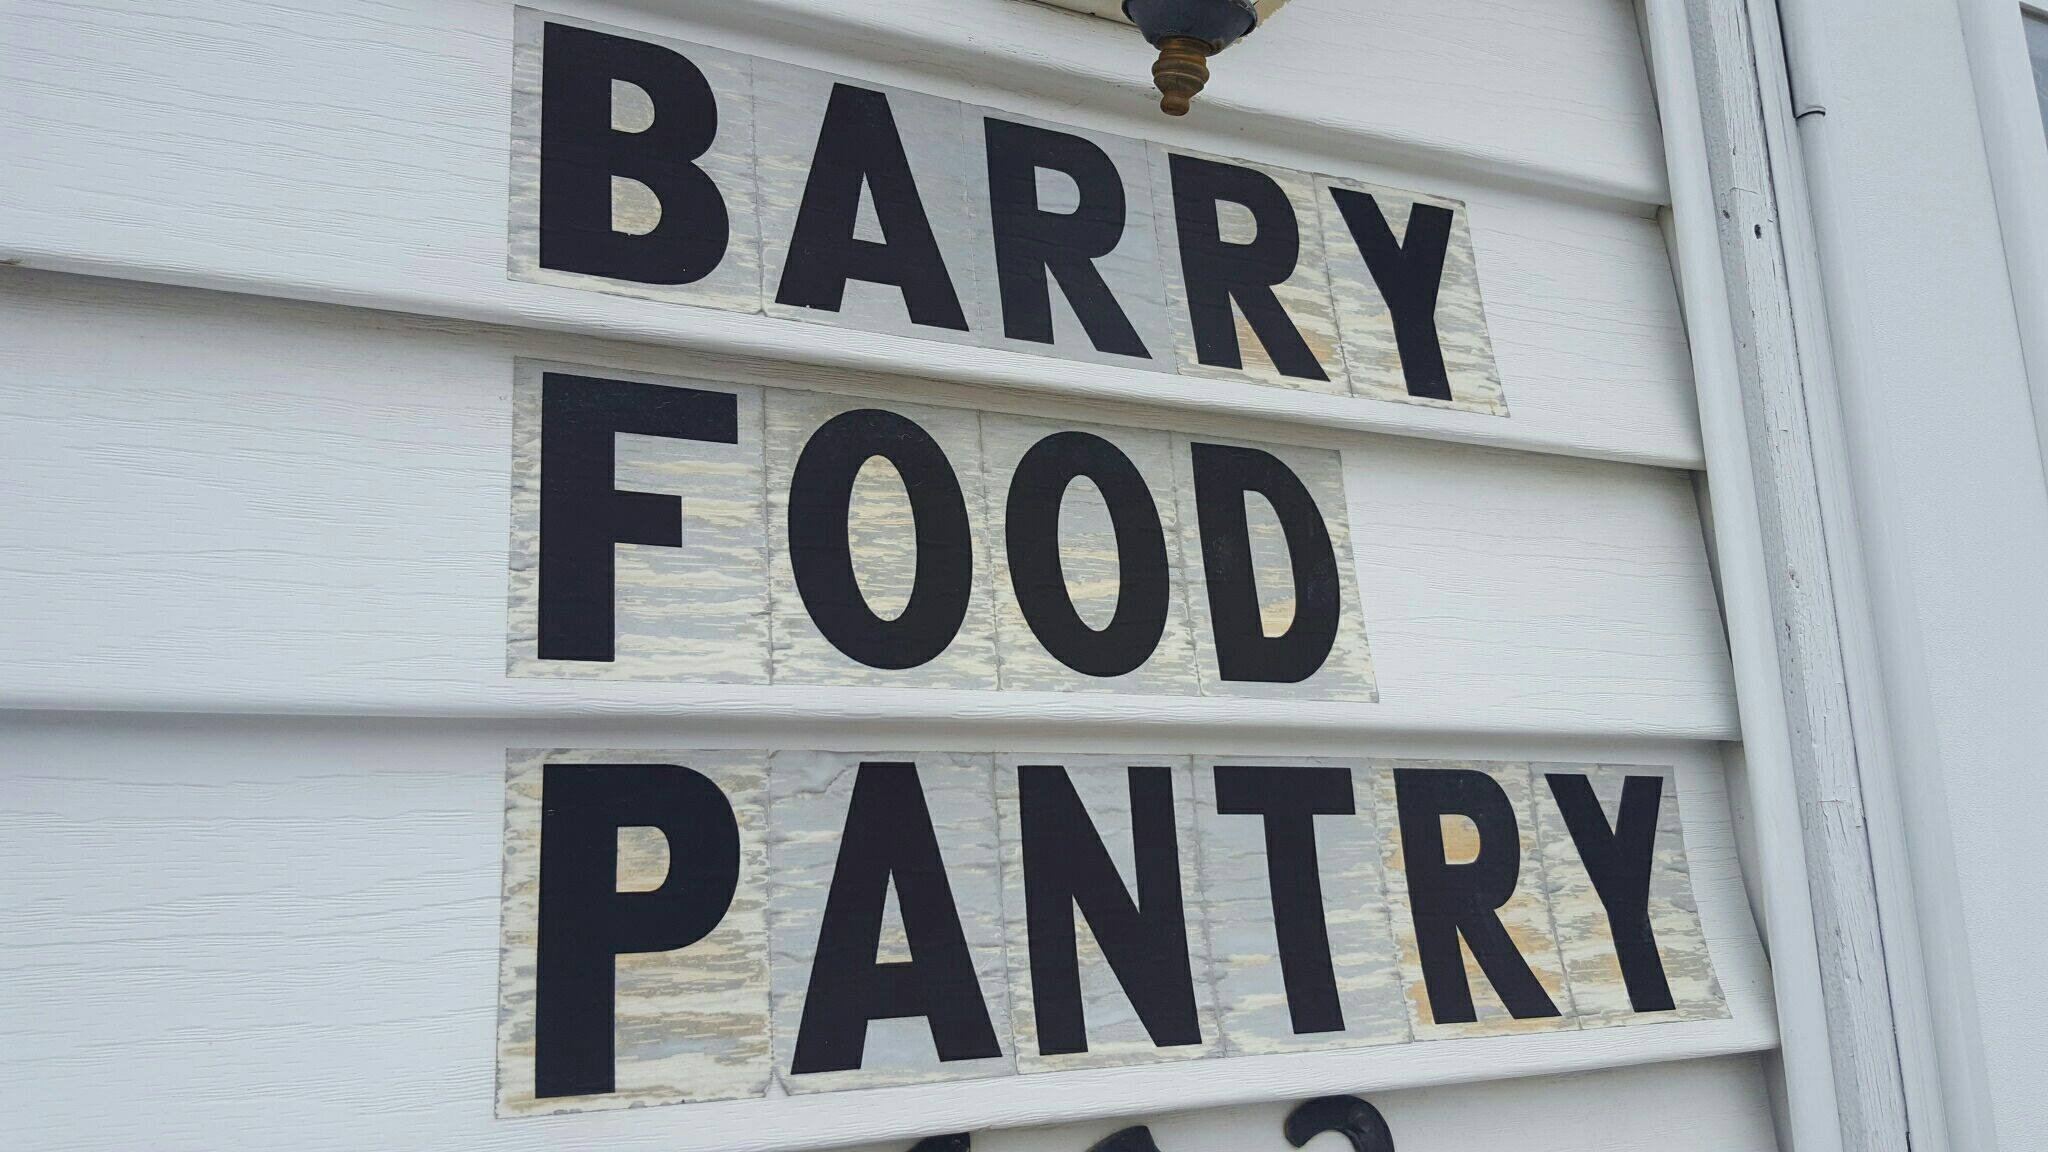 New days hours for Barry food pantry WREXcom Rockfords News